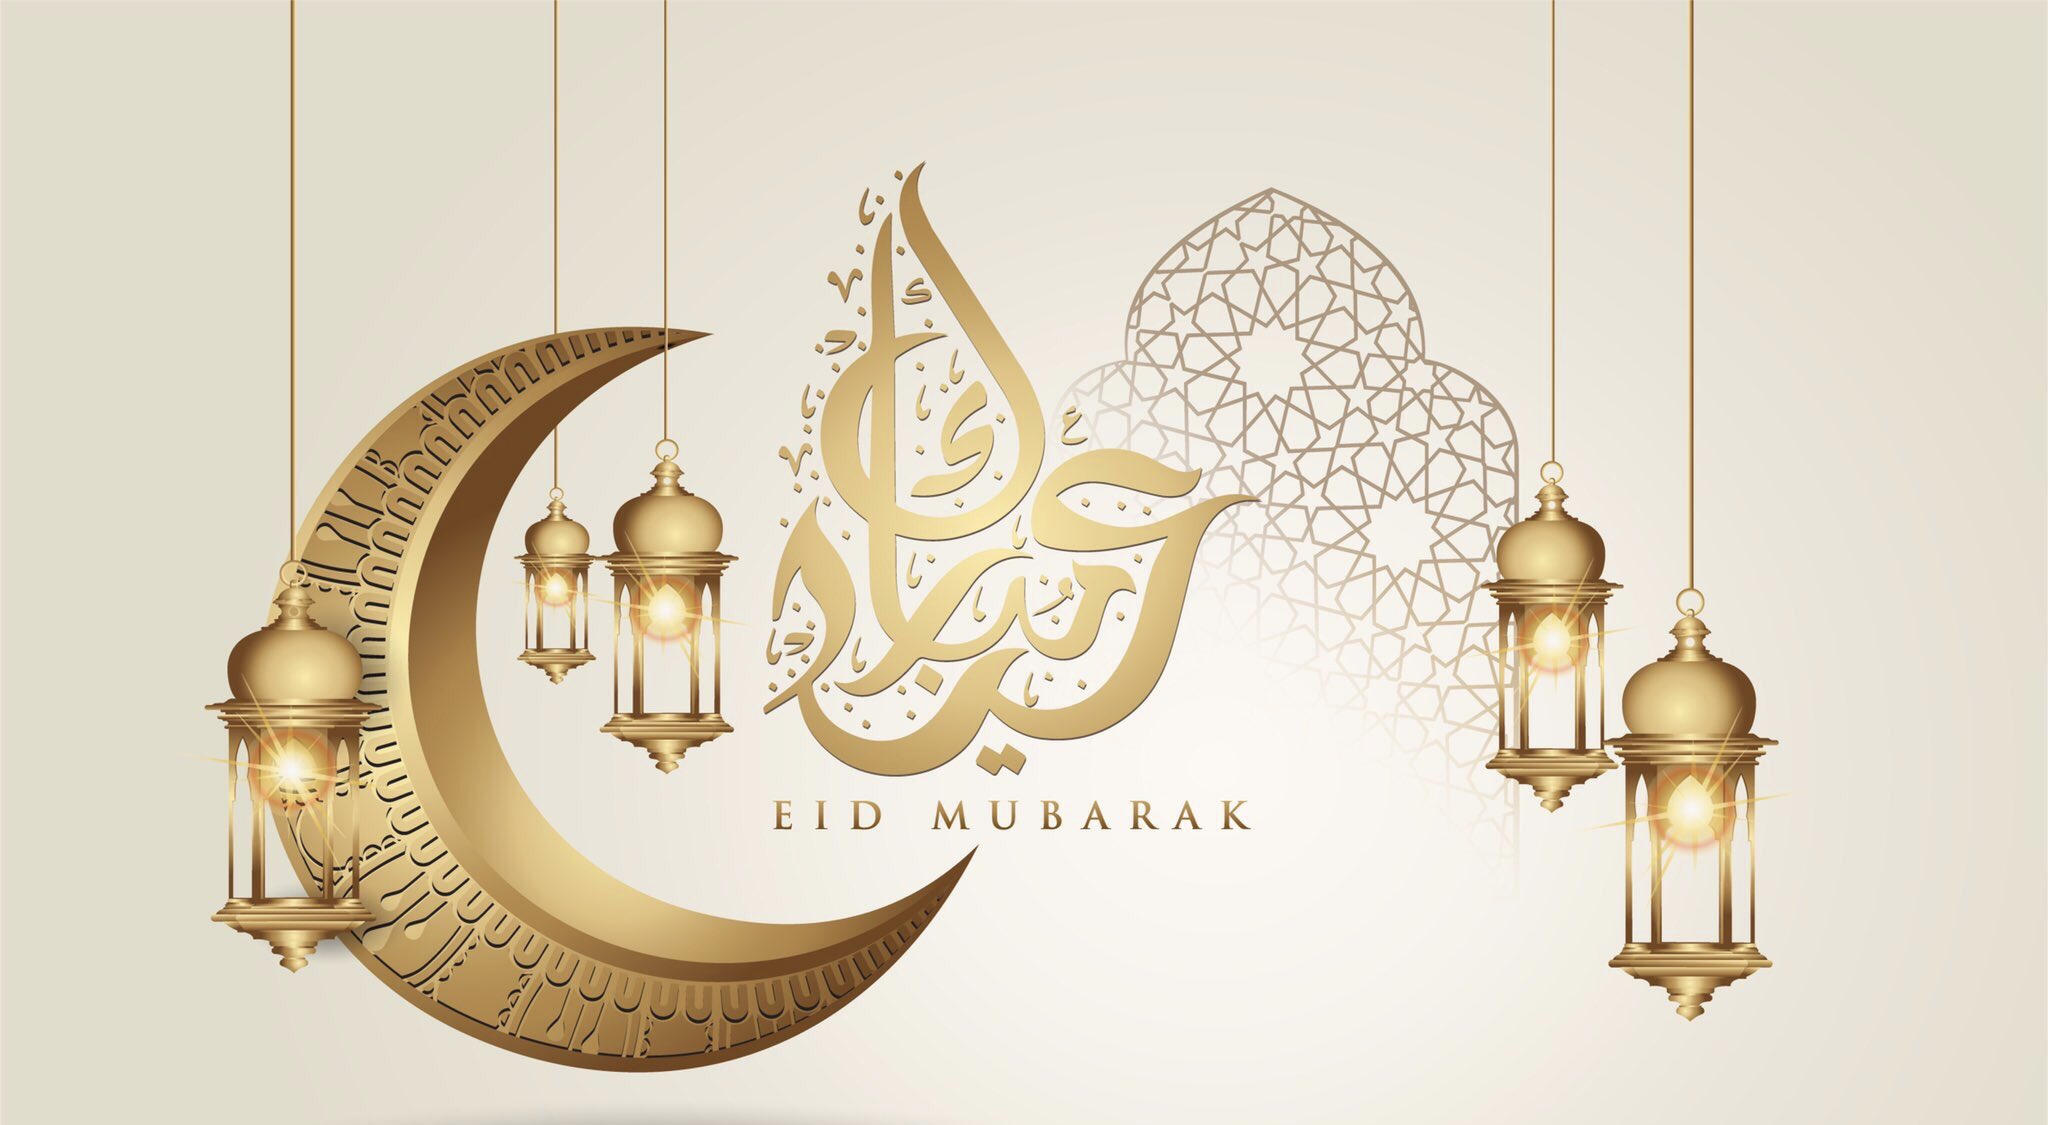 Silver Cultured  Eid Mubarak online greeting cards